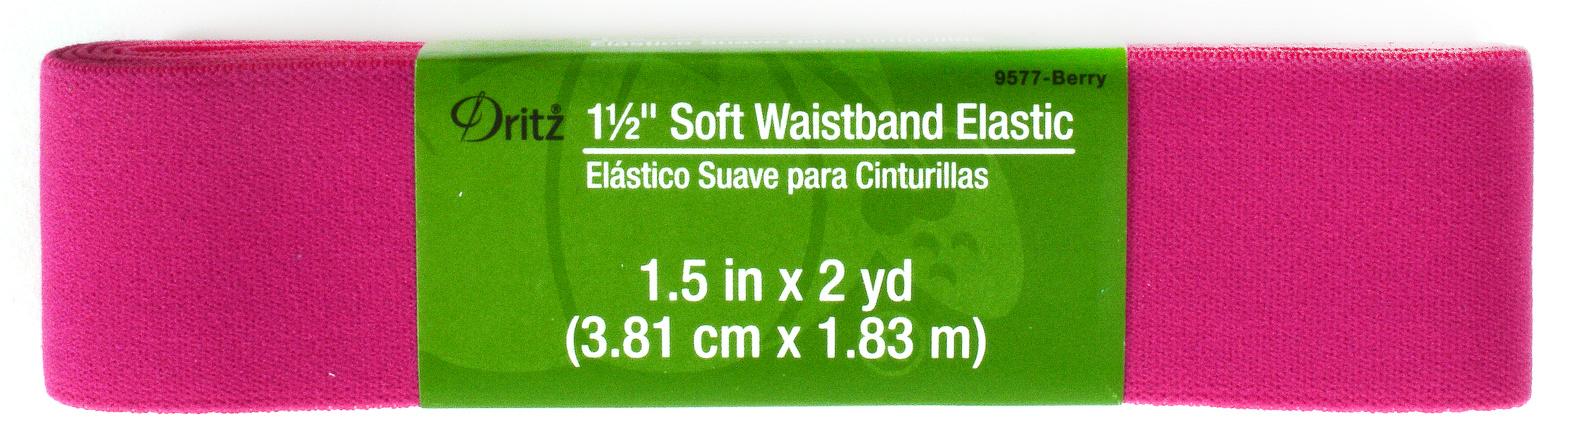 aca1b68790 Dritz 1 1 2 u0022 Soft Waistband Elastic Berry